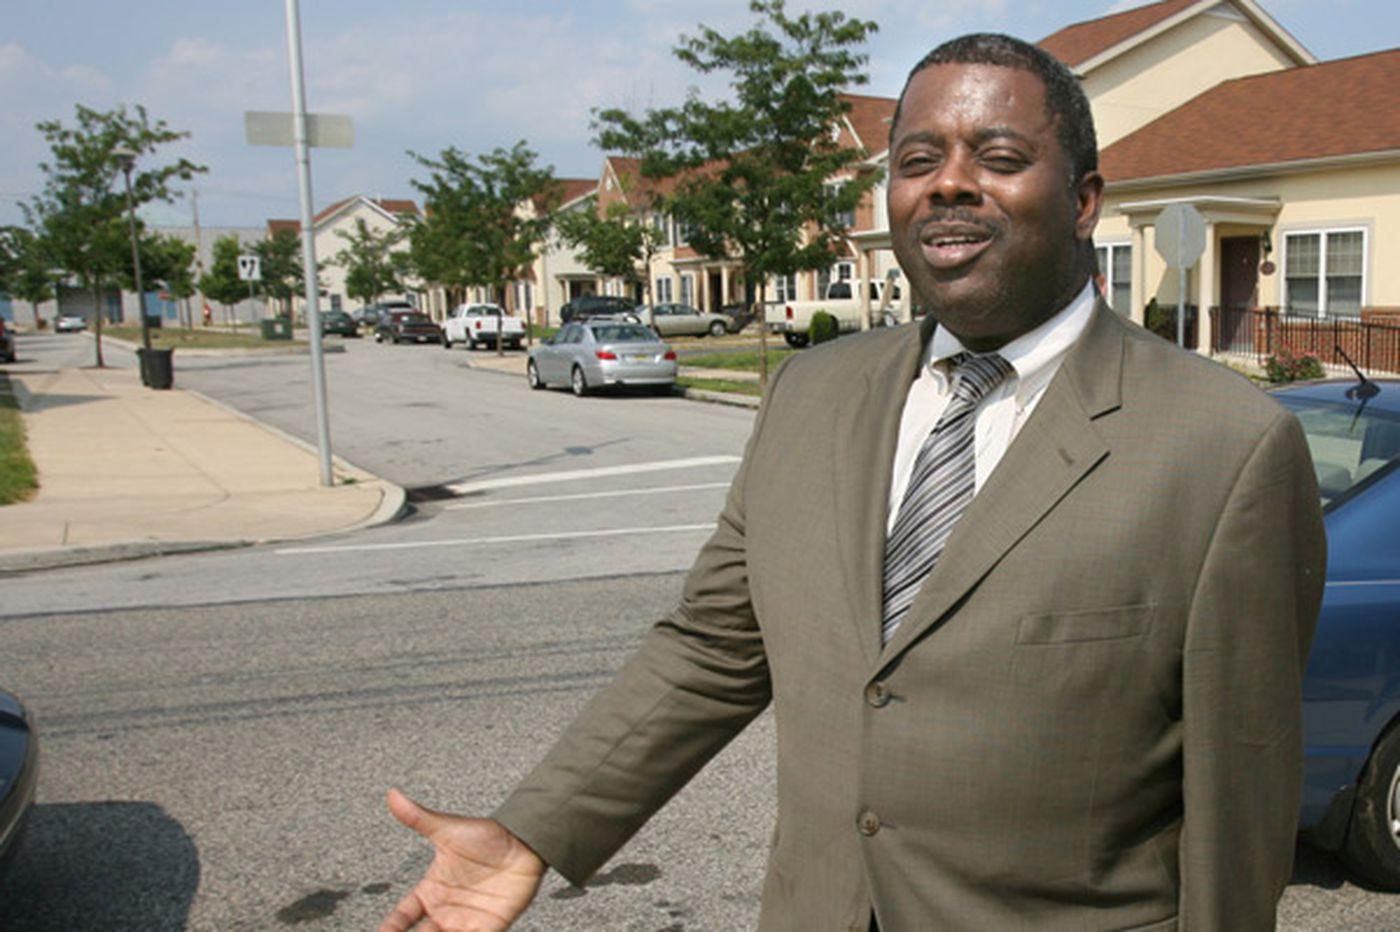 HUD proposes former PHA director Greene be barred